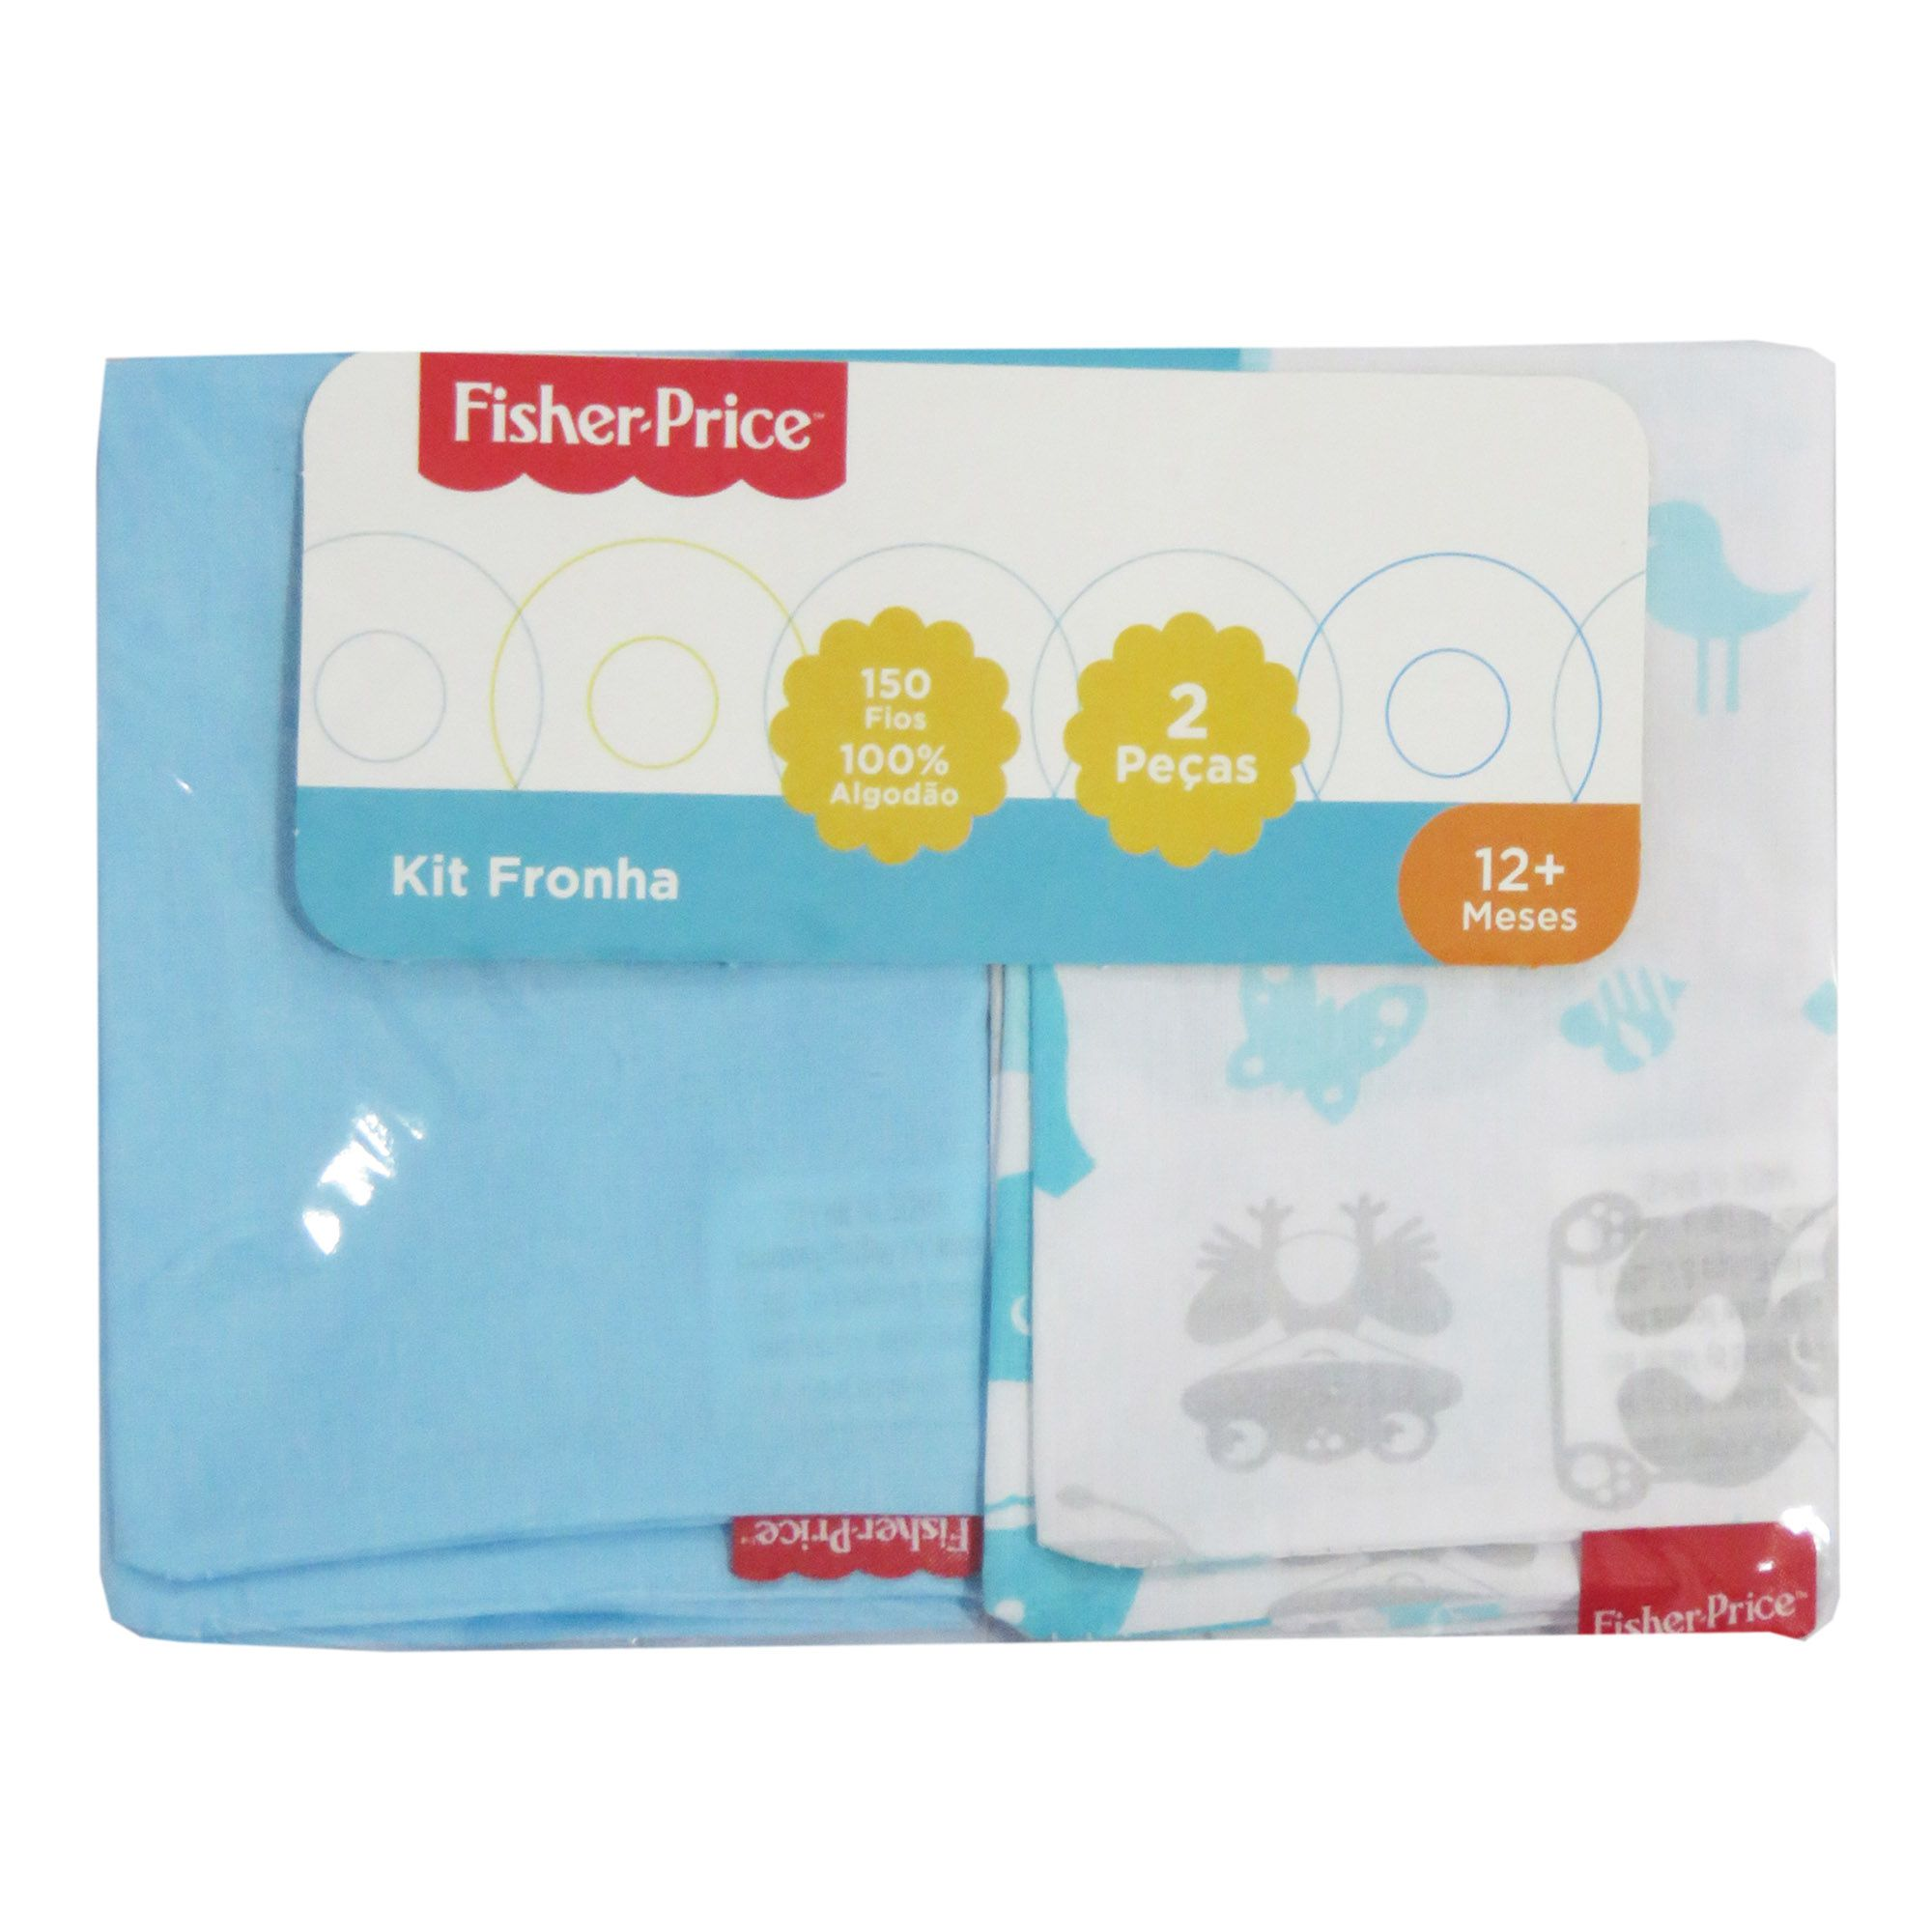 Kit Fronha Incomfral Fisher-Price - Azul Claro